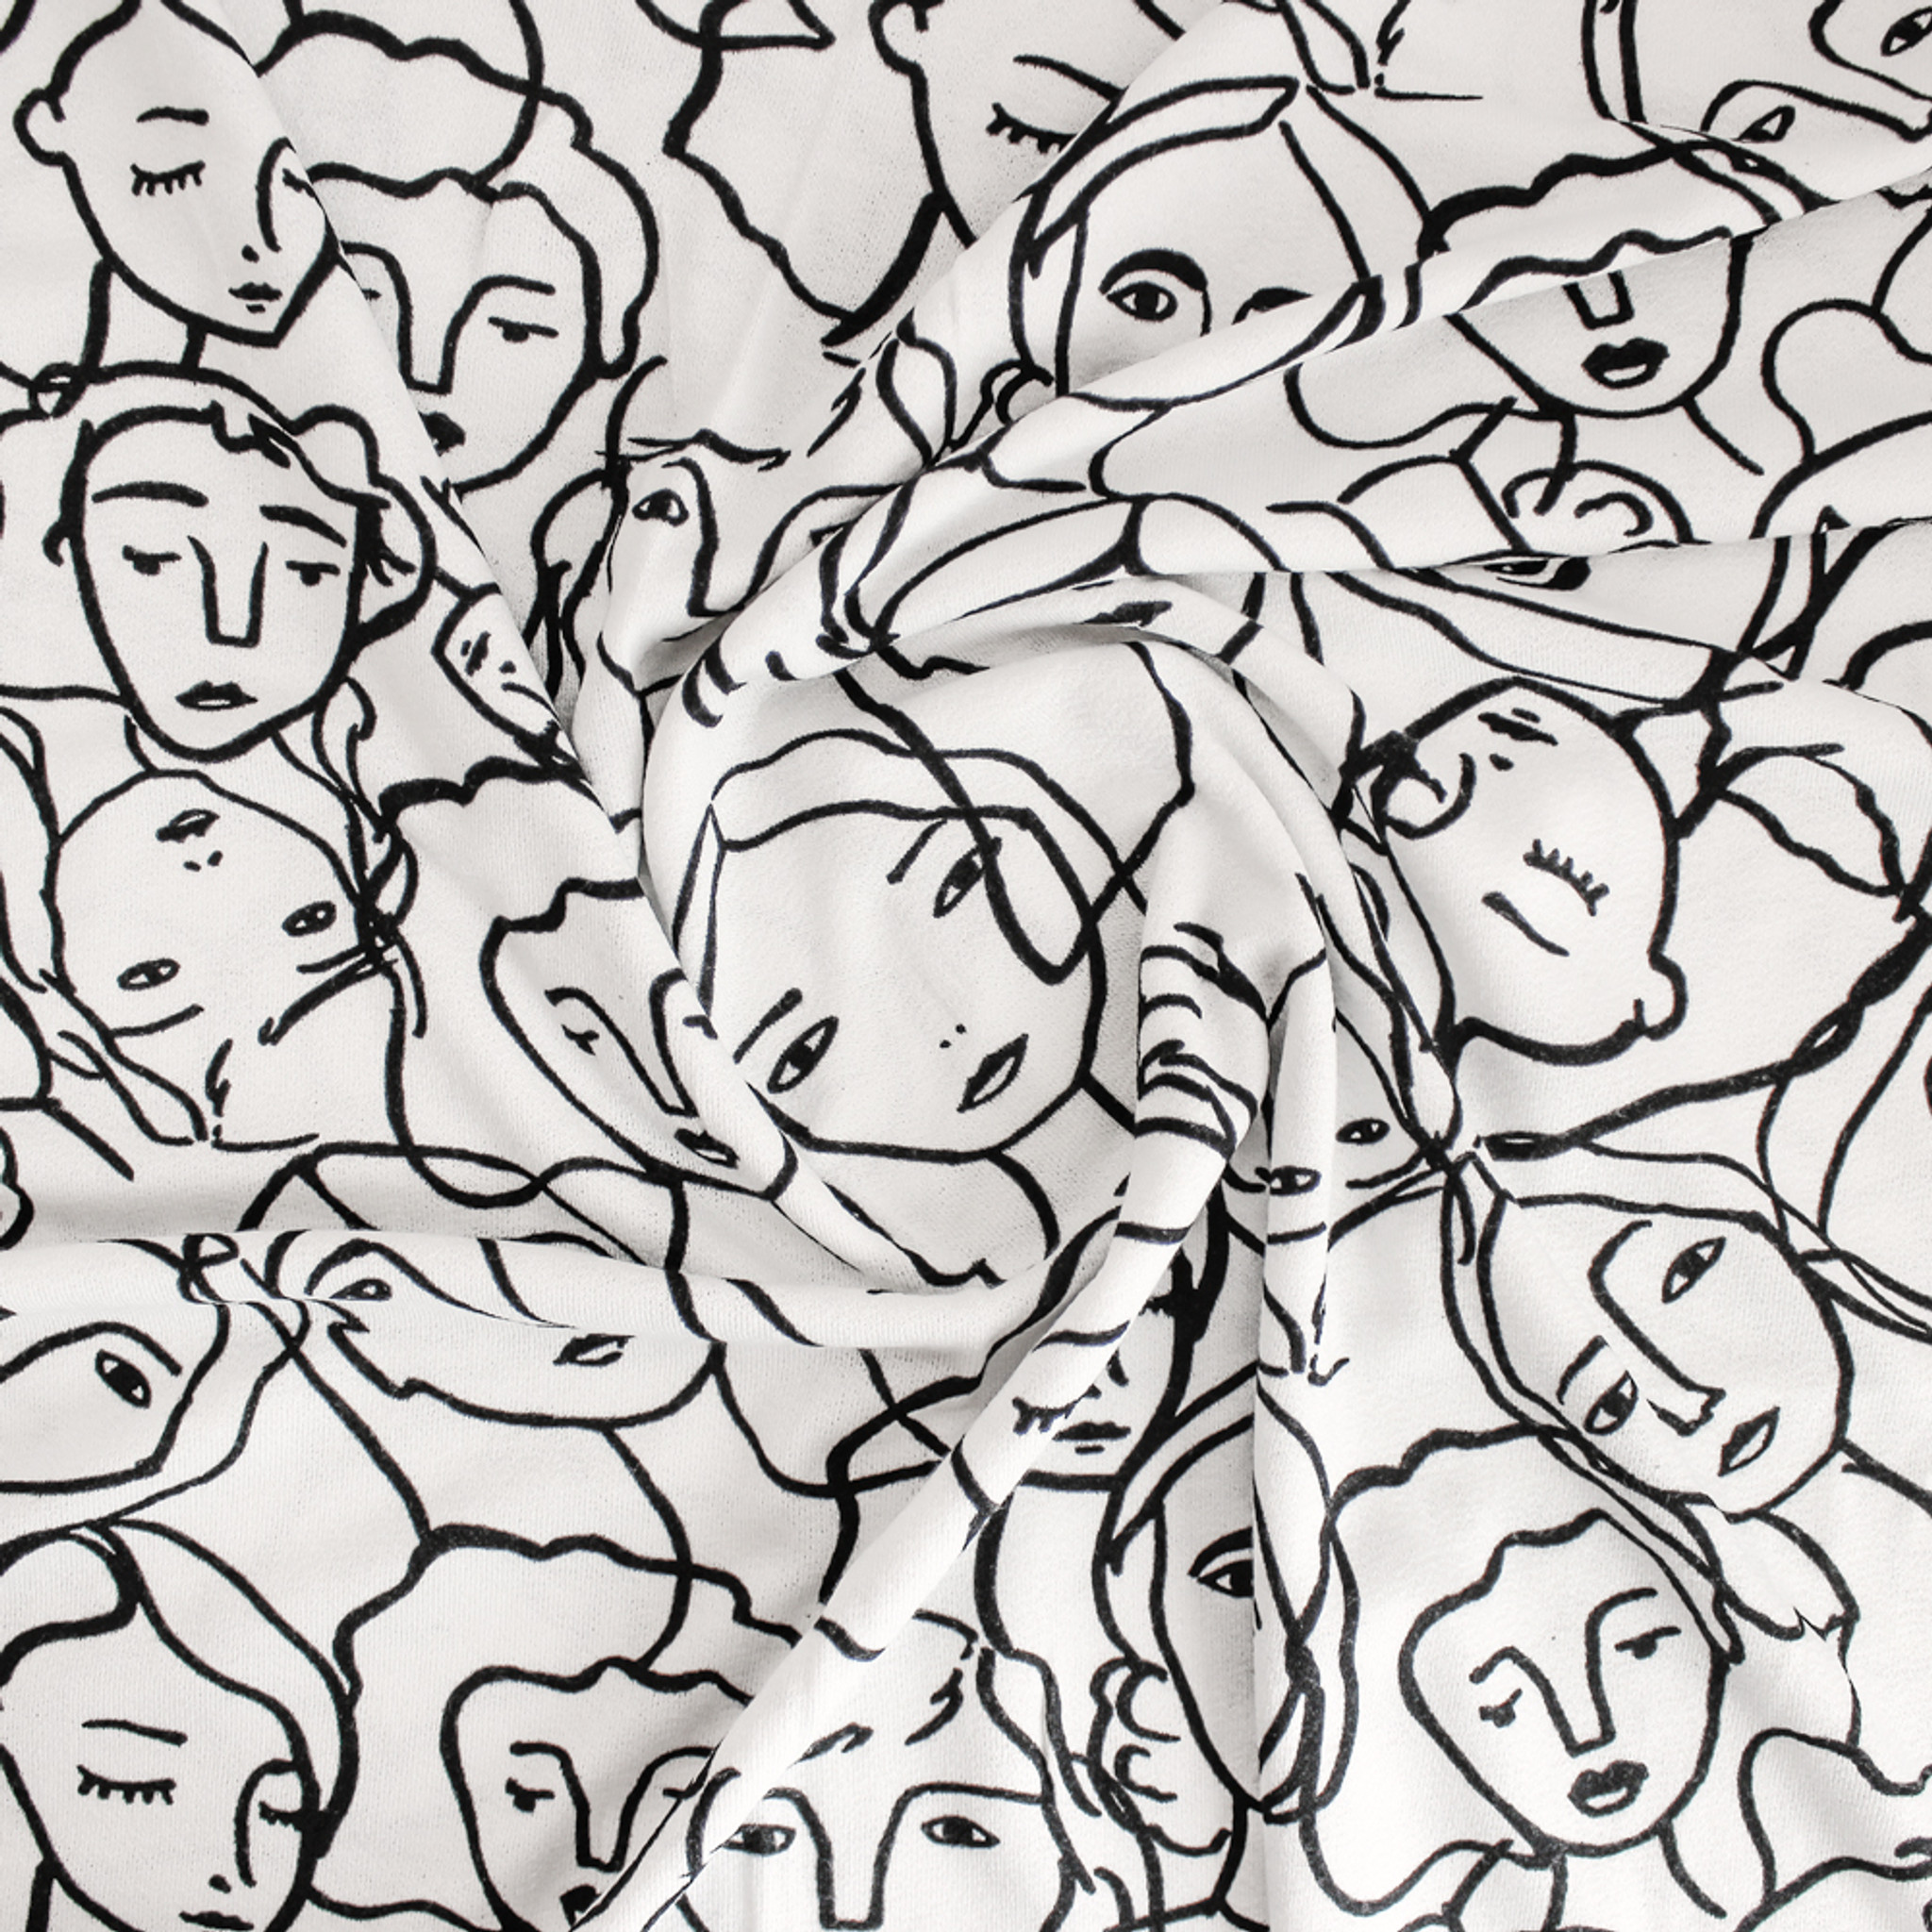 2f29d4d49f2 Crowded Faces Viscose Crepe Jersey - White/Black | Blackbird Fabrics